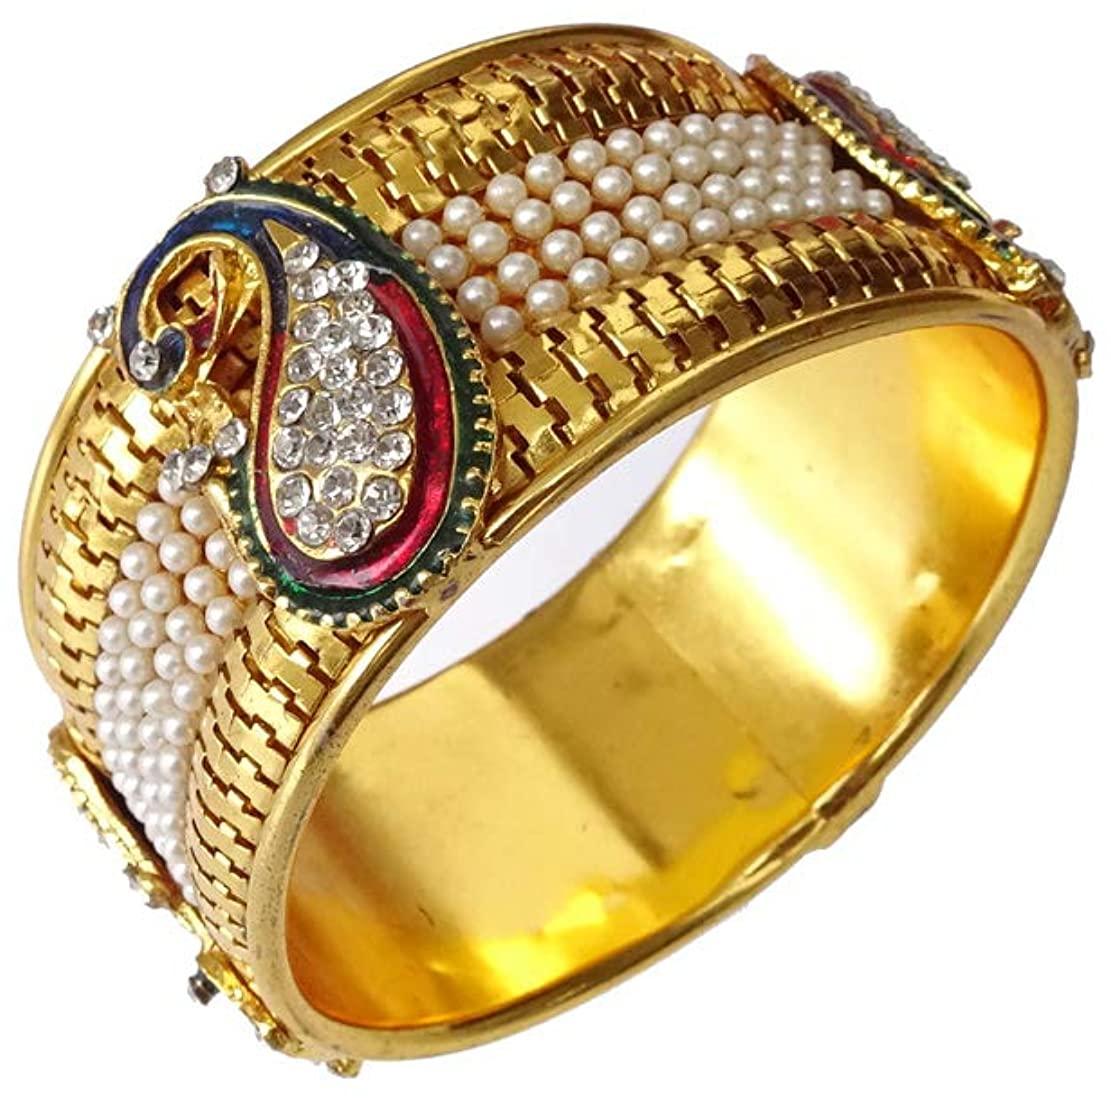 India Jewel Store Bangle Bracelet for Women Girl Unisex Zircon & Pearl Gemstone Authantic Handmade Bangle Bracelet Boho Filigree Ethnic Tribal Bracelet Handmade in Gold Plated